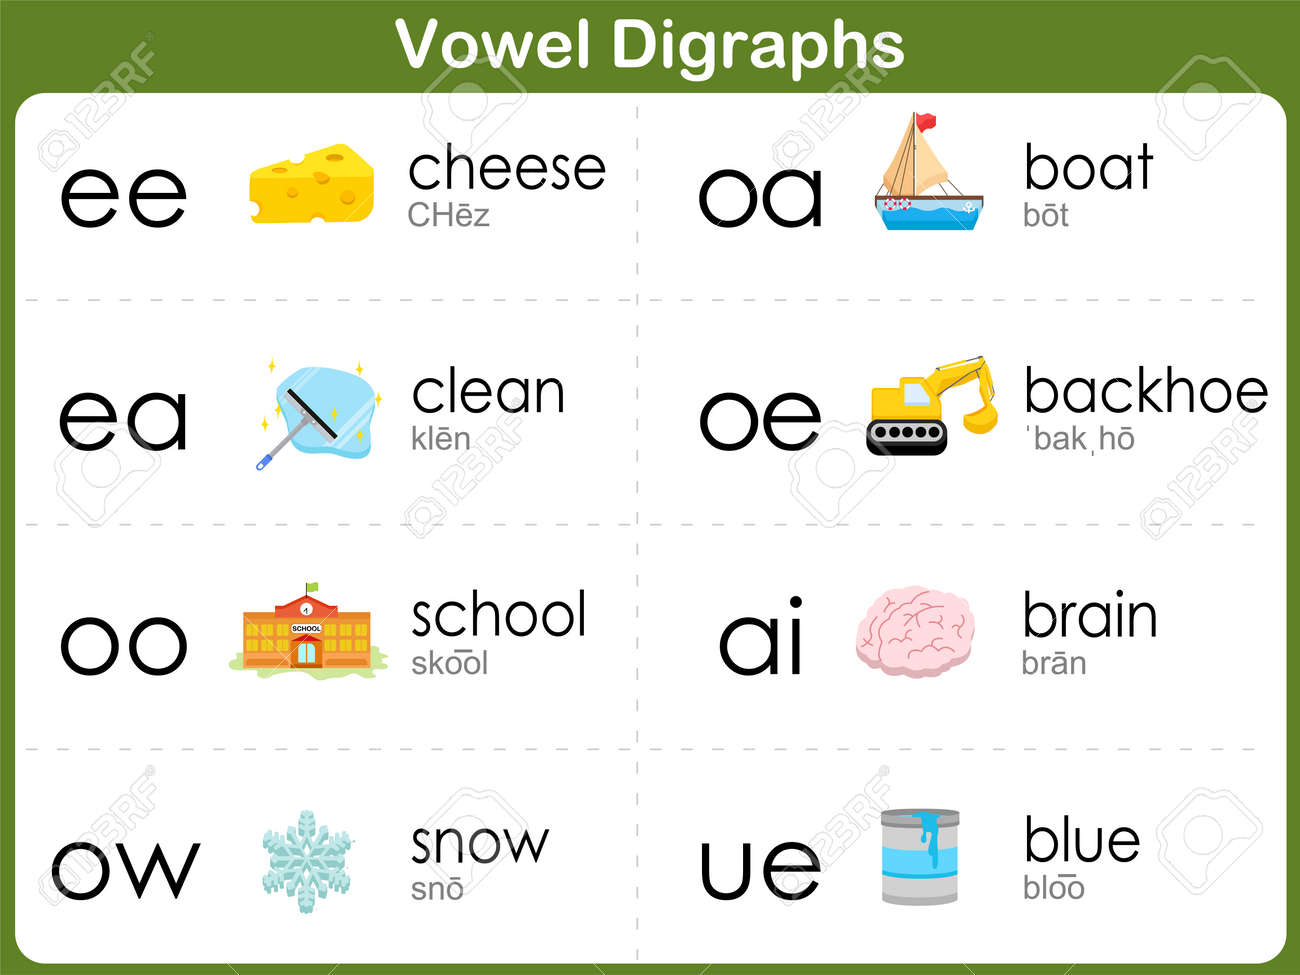 Worksheets Vowel Digraph Worksheets vowel digraph worksheets rringband digraphs worksheet for kids royalty free cliparts vectors